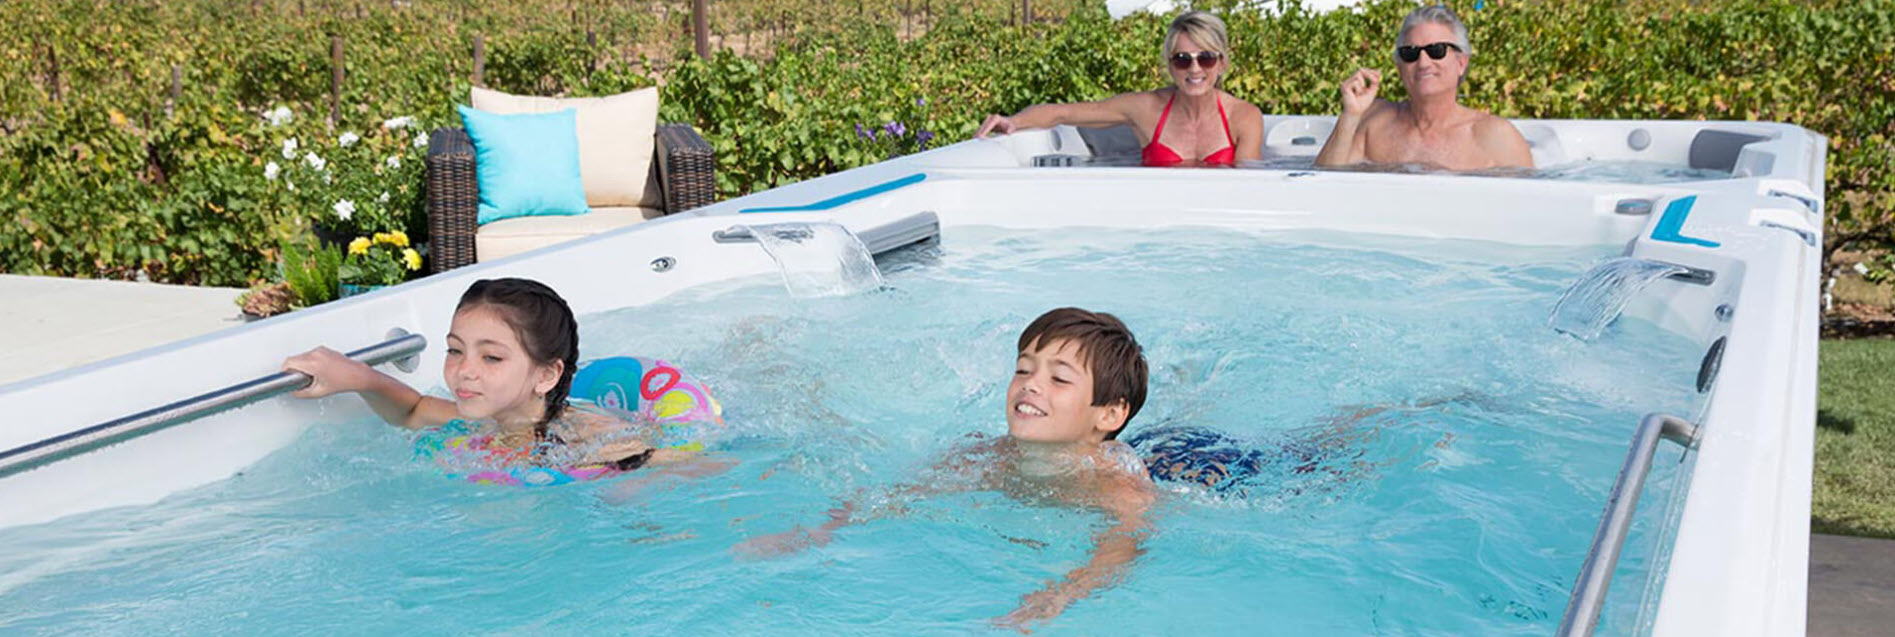 All Natural Arthritis Relief in a Lap Pool, Swim Spa Prices Minneapolis